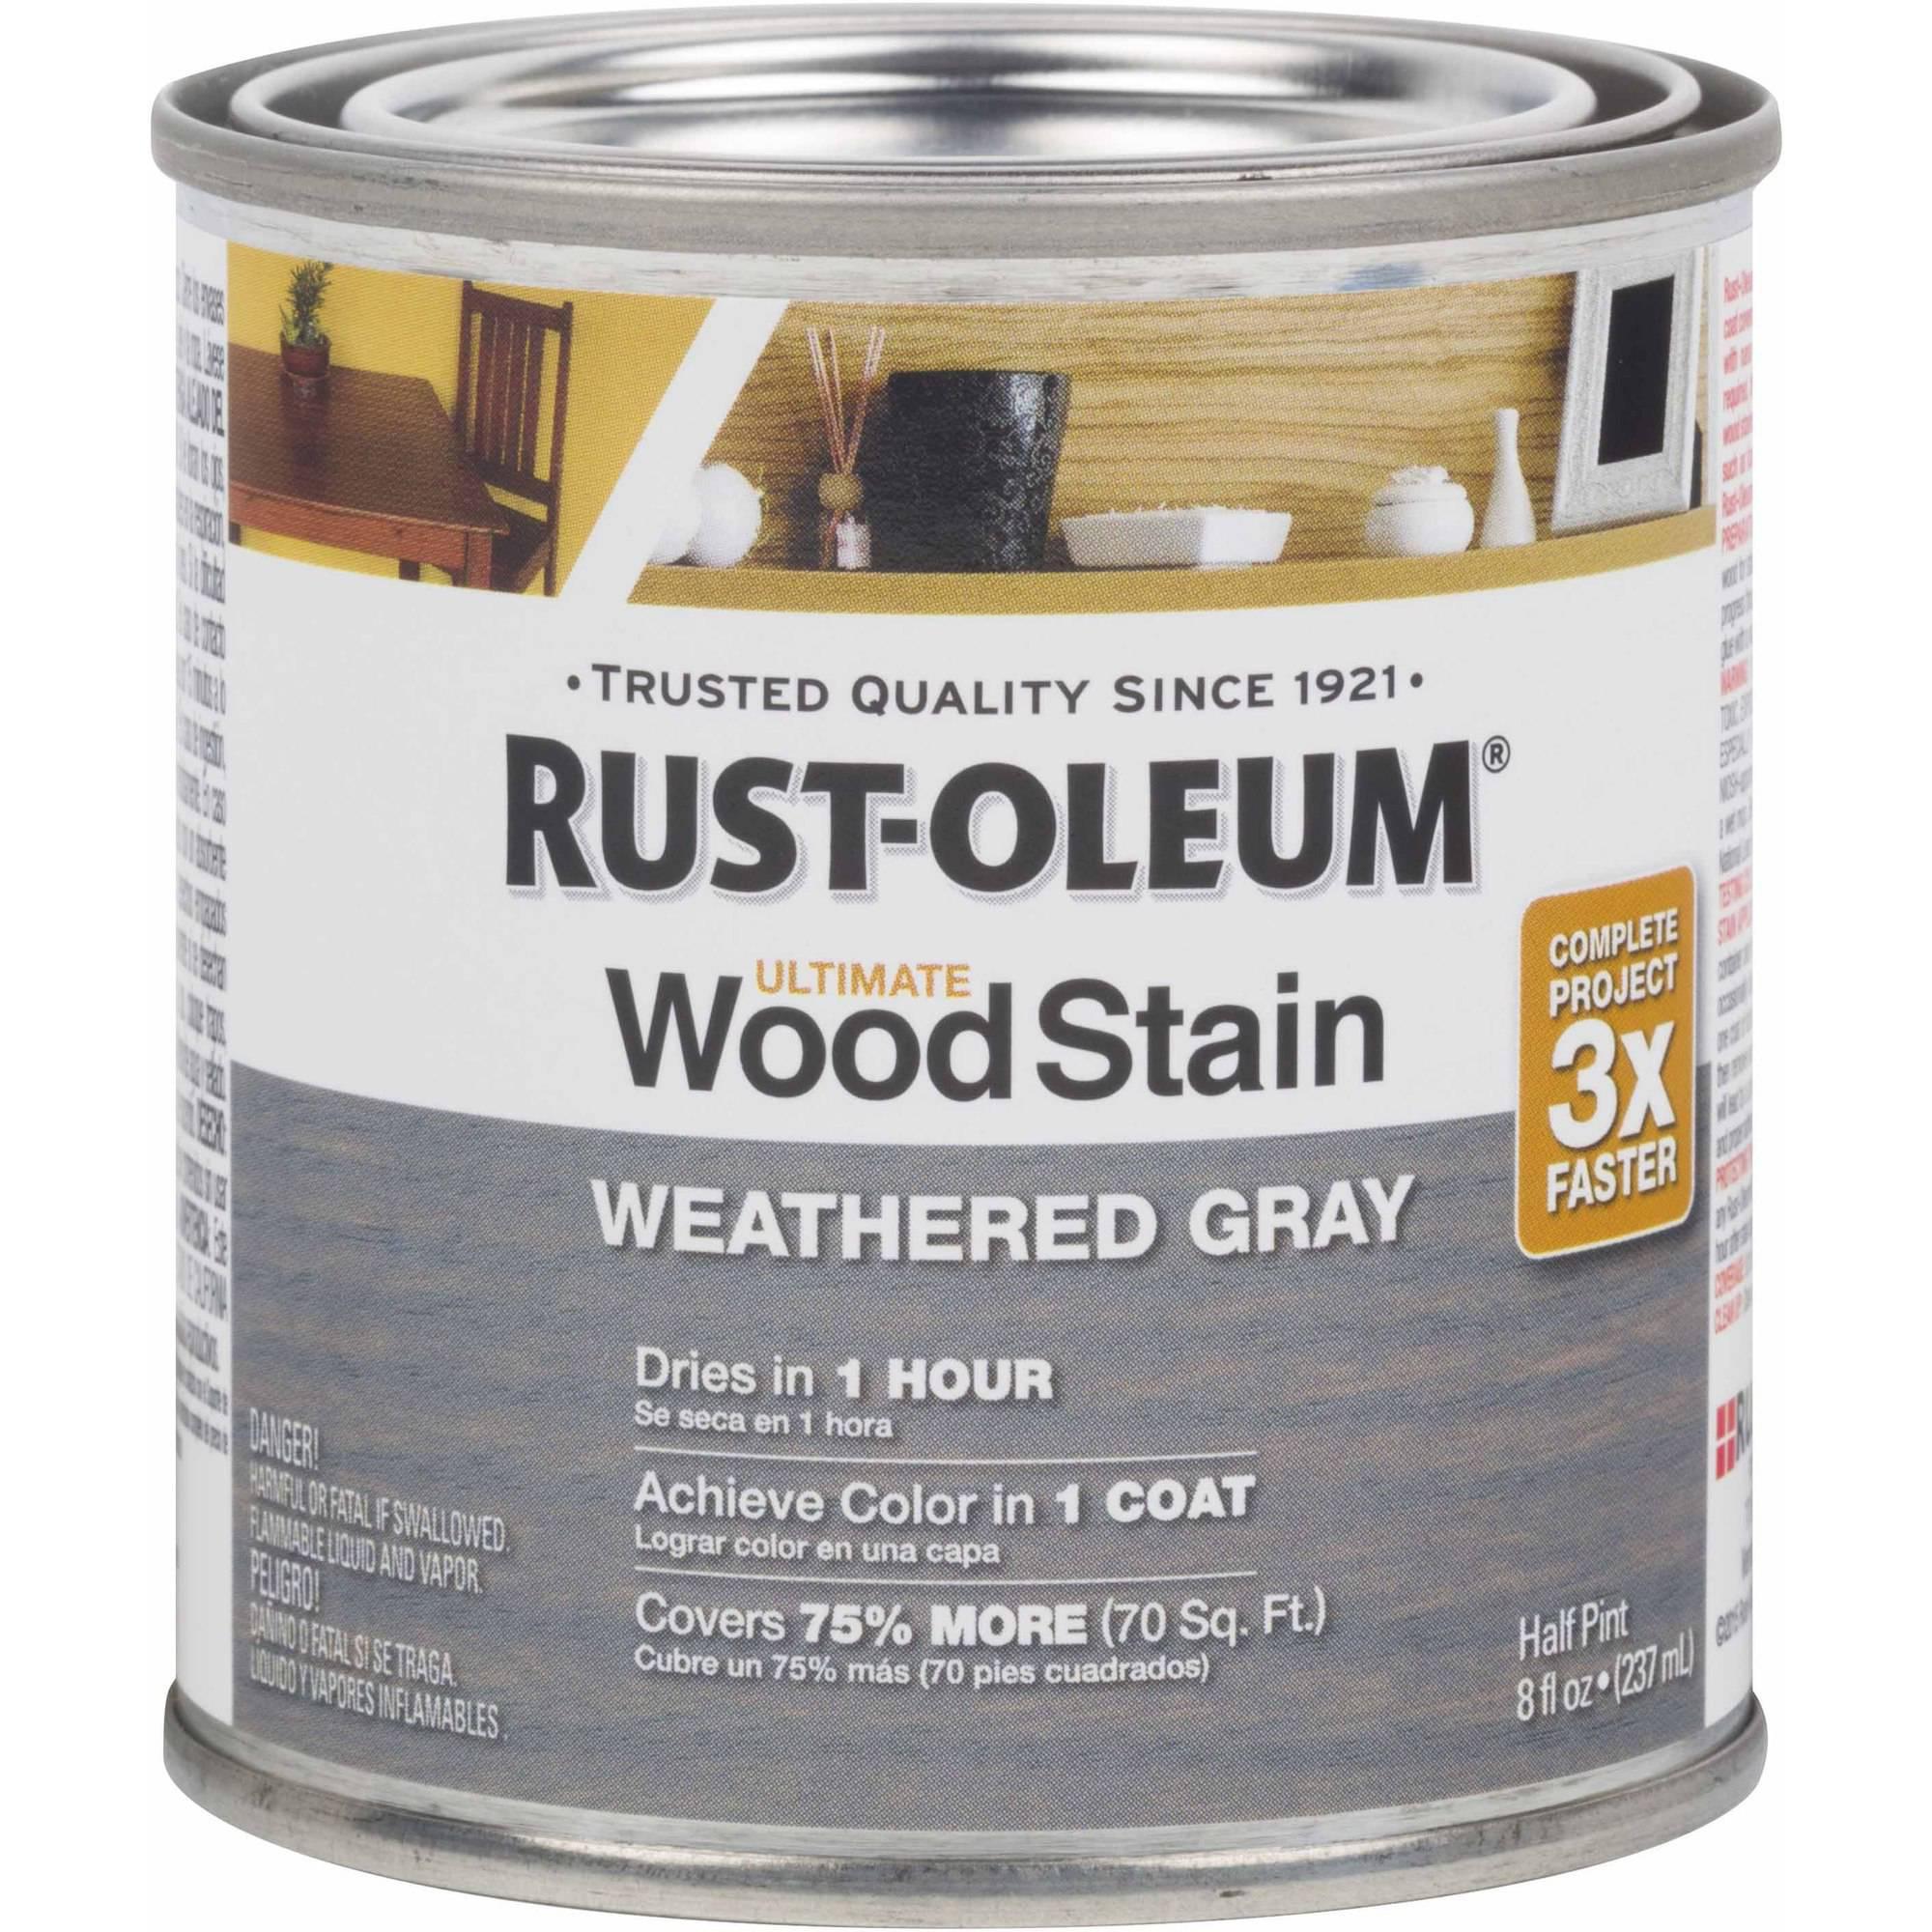 Rust-Oleum Ultimate Wood Stain Half-Pint, Weathered Gray